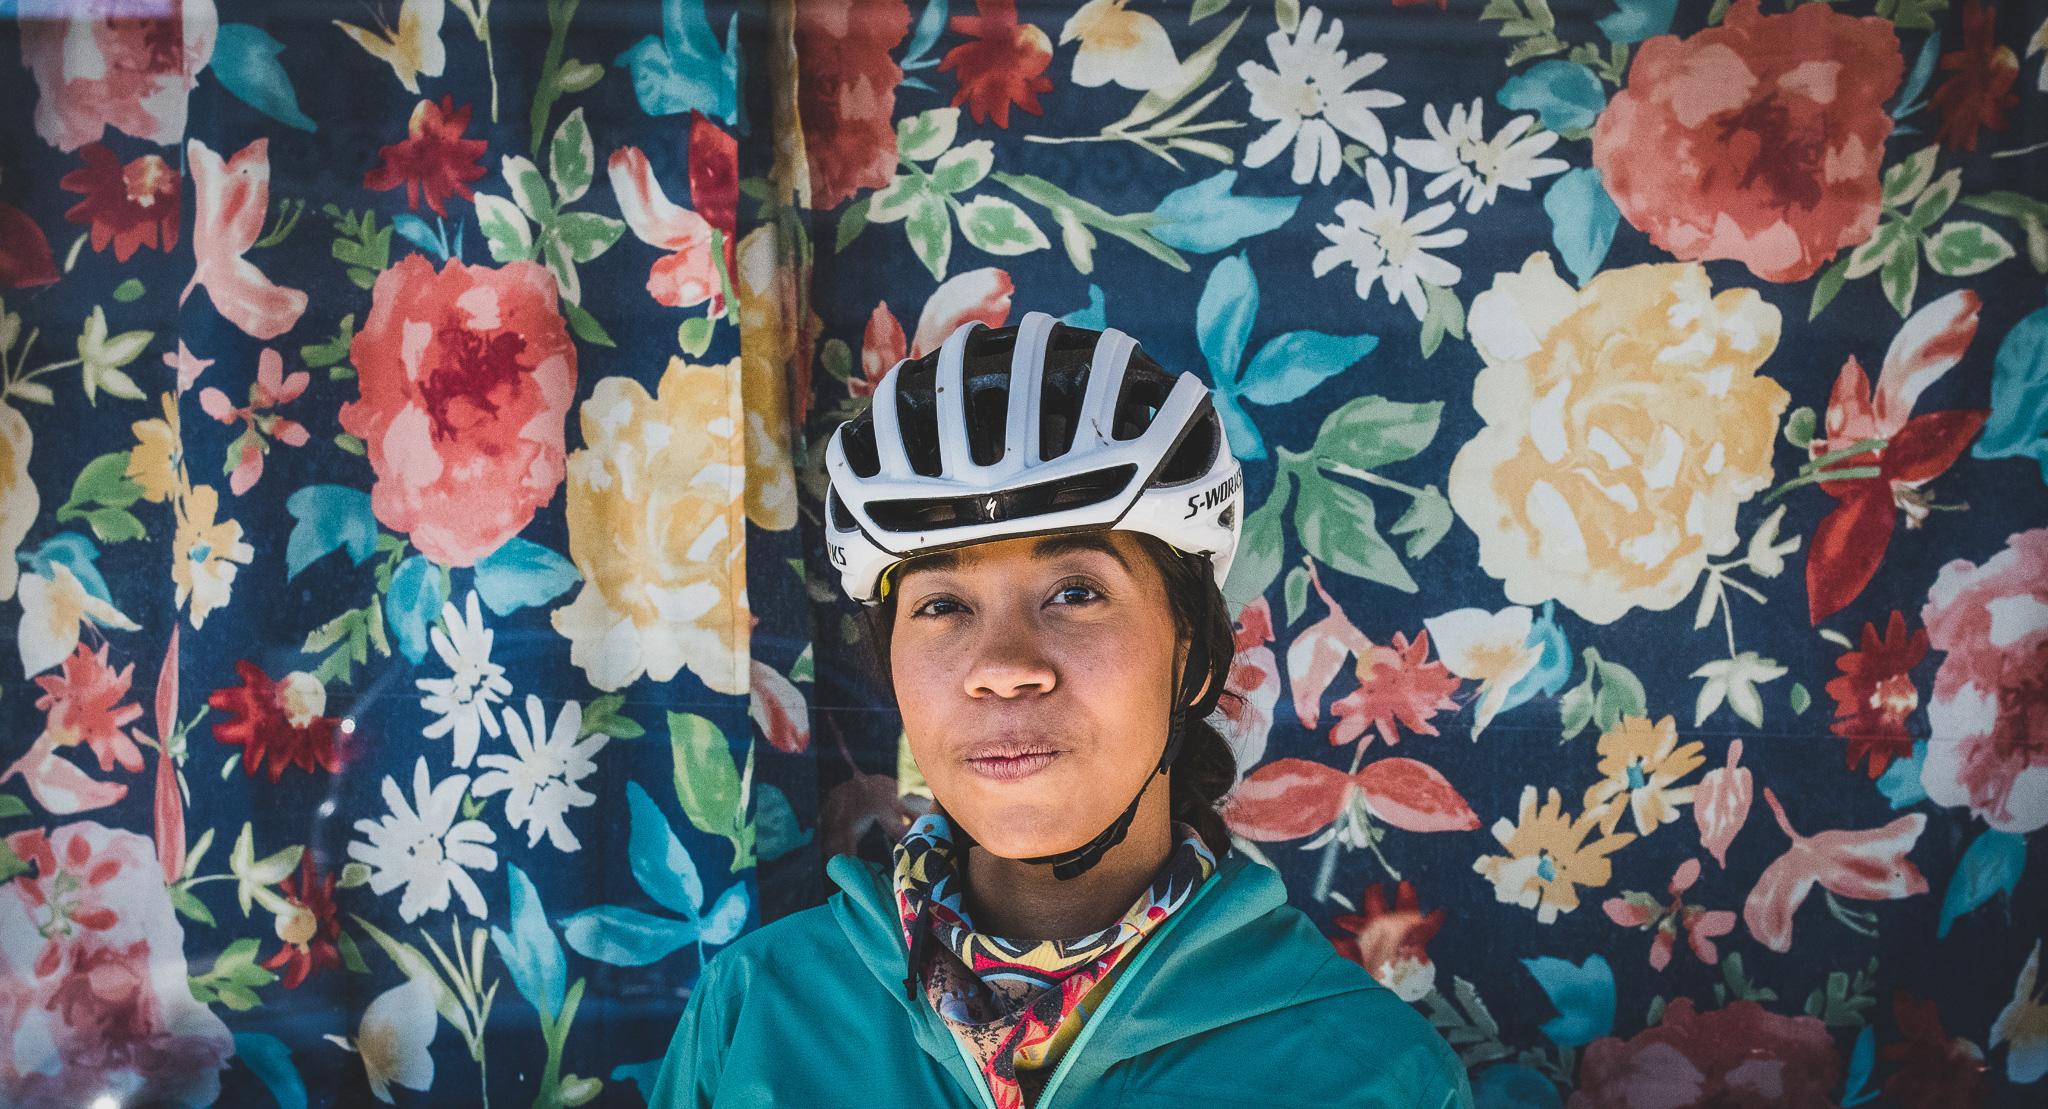 Rachel Olzer - Cyclist